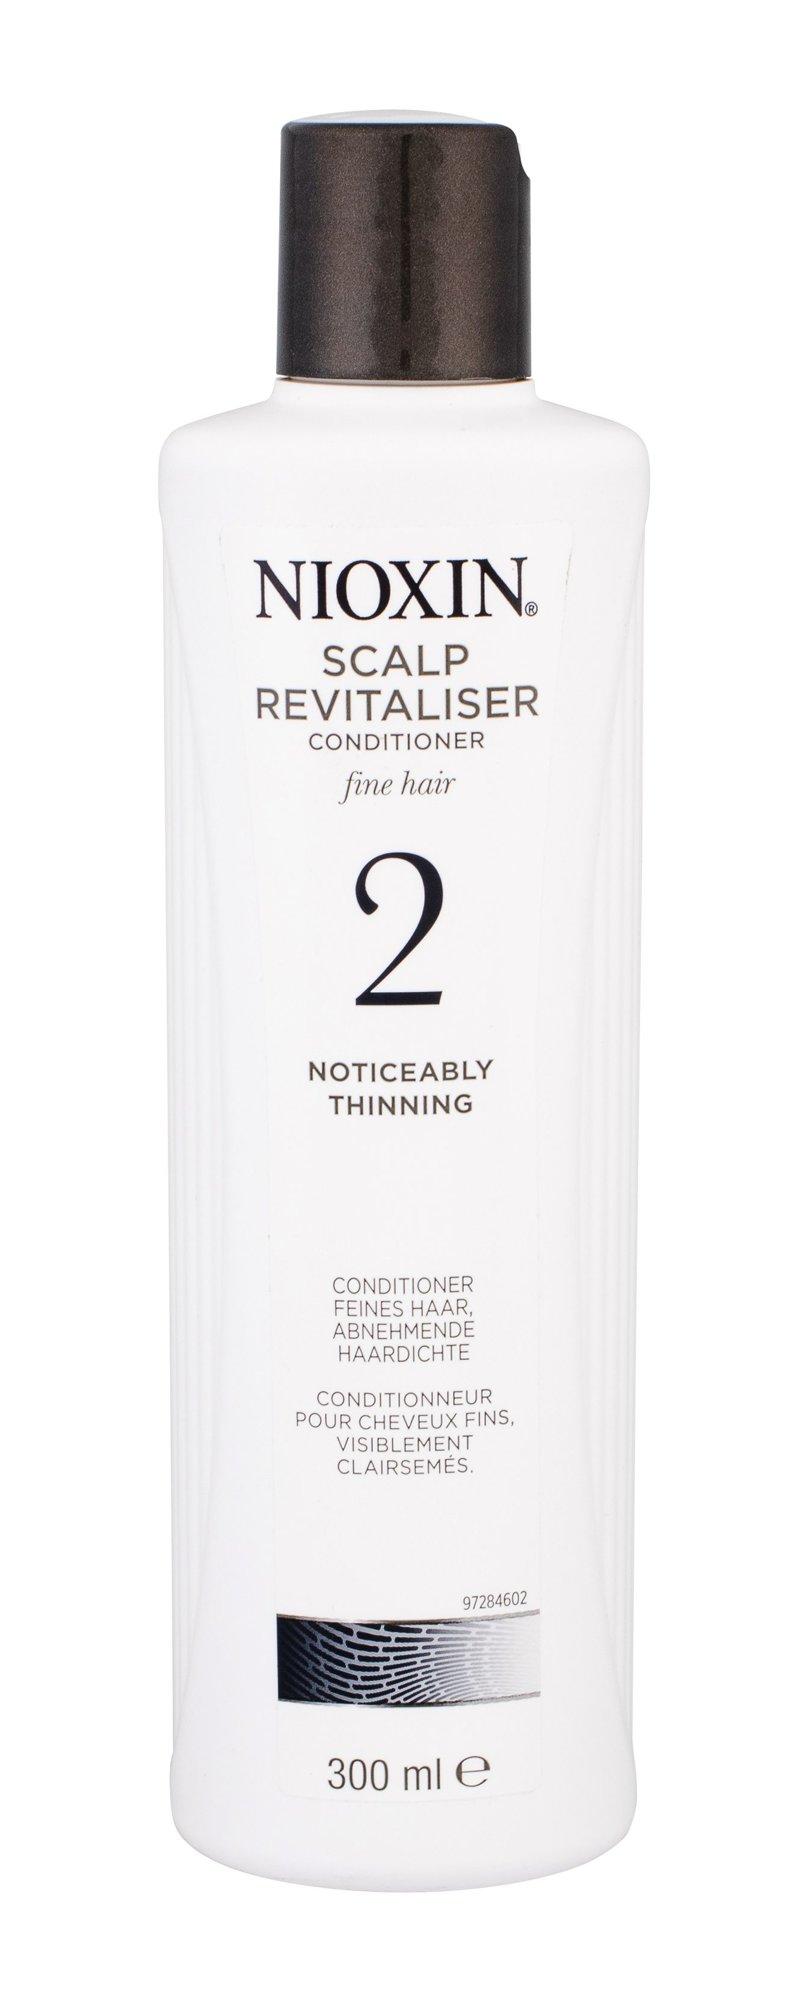 Nioxin System 2 Cosmetic 300ml  Scalp Revitaliser Conditioner